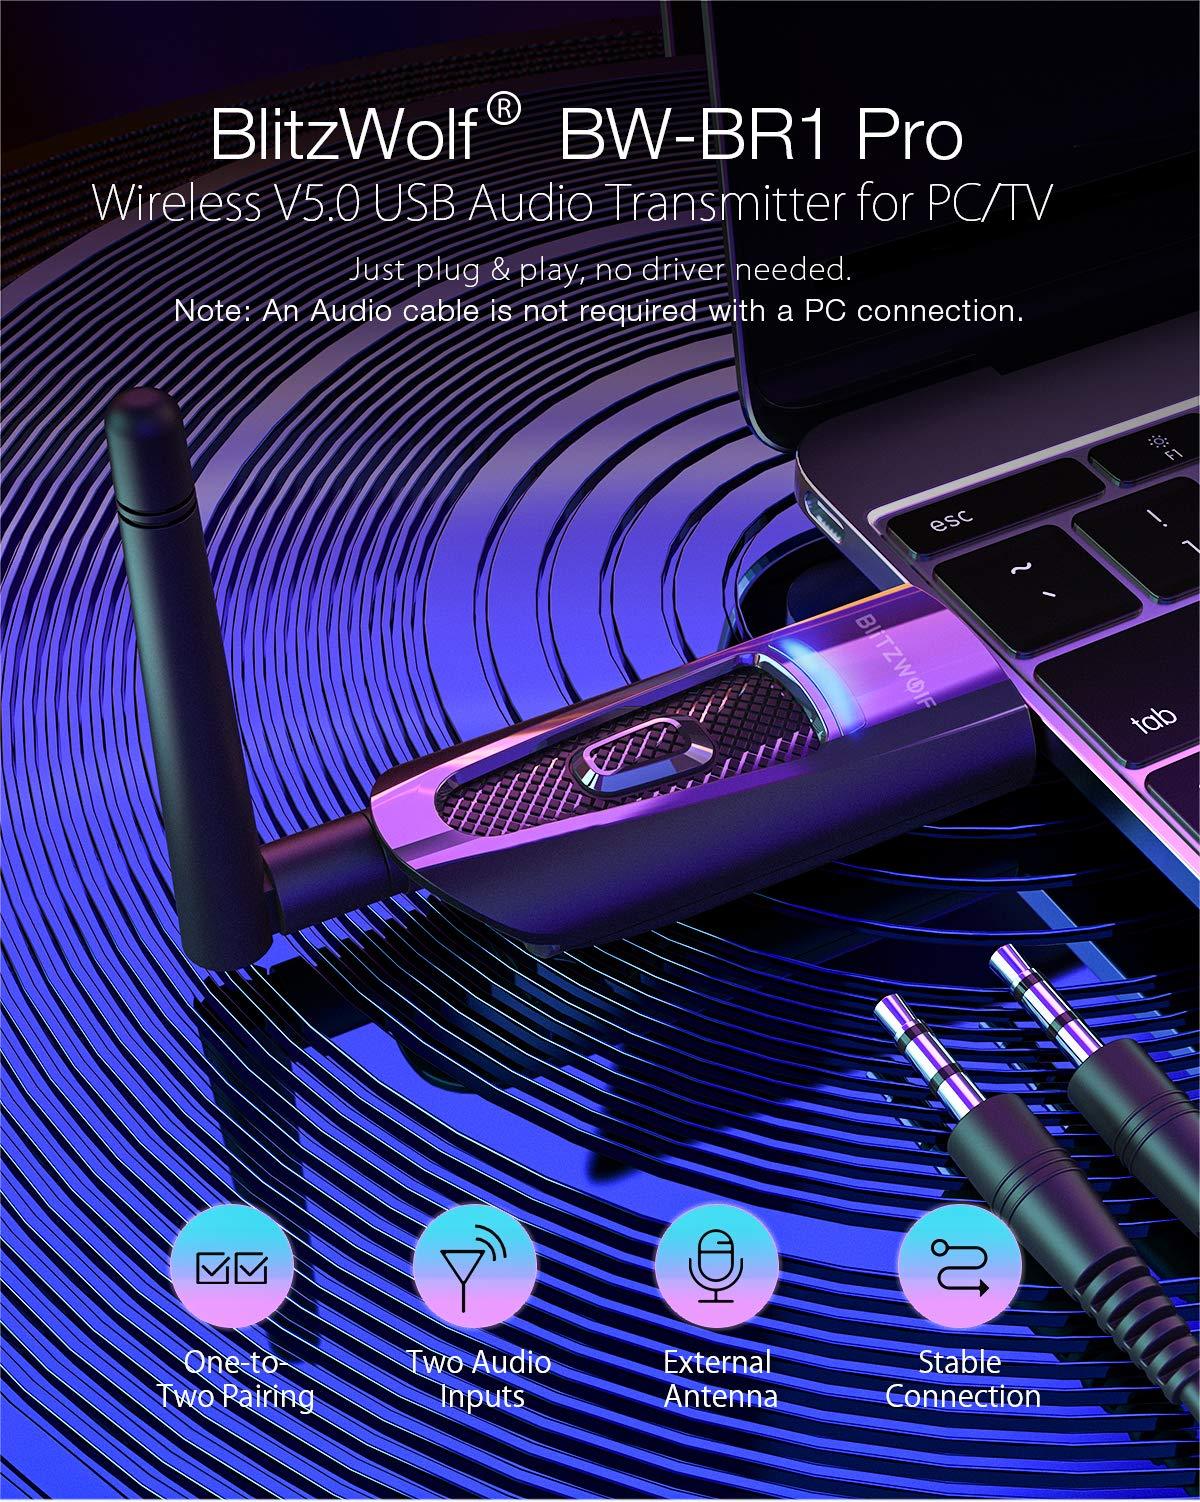 BlitzWolf Transmisor Bluetooth 5.0, Adaptador Bluetooth Audio para PC TV, Conecta 2 Dispositivos Simultáneamente, Conexión de USB y Cable de Audio de 3.5mm, Antena Externa, Conexión Estable: Amazon.es: Electrónica